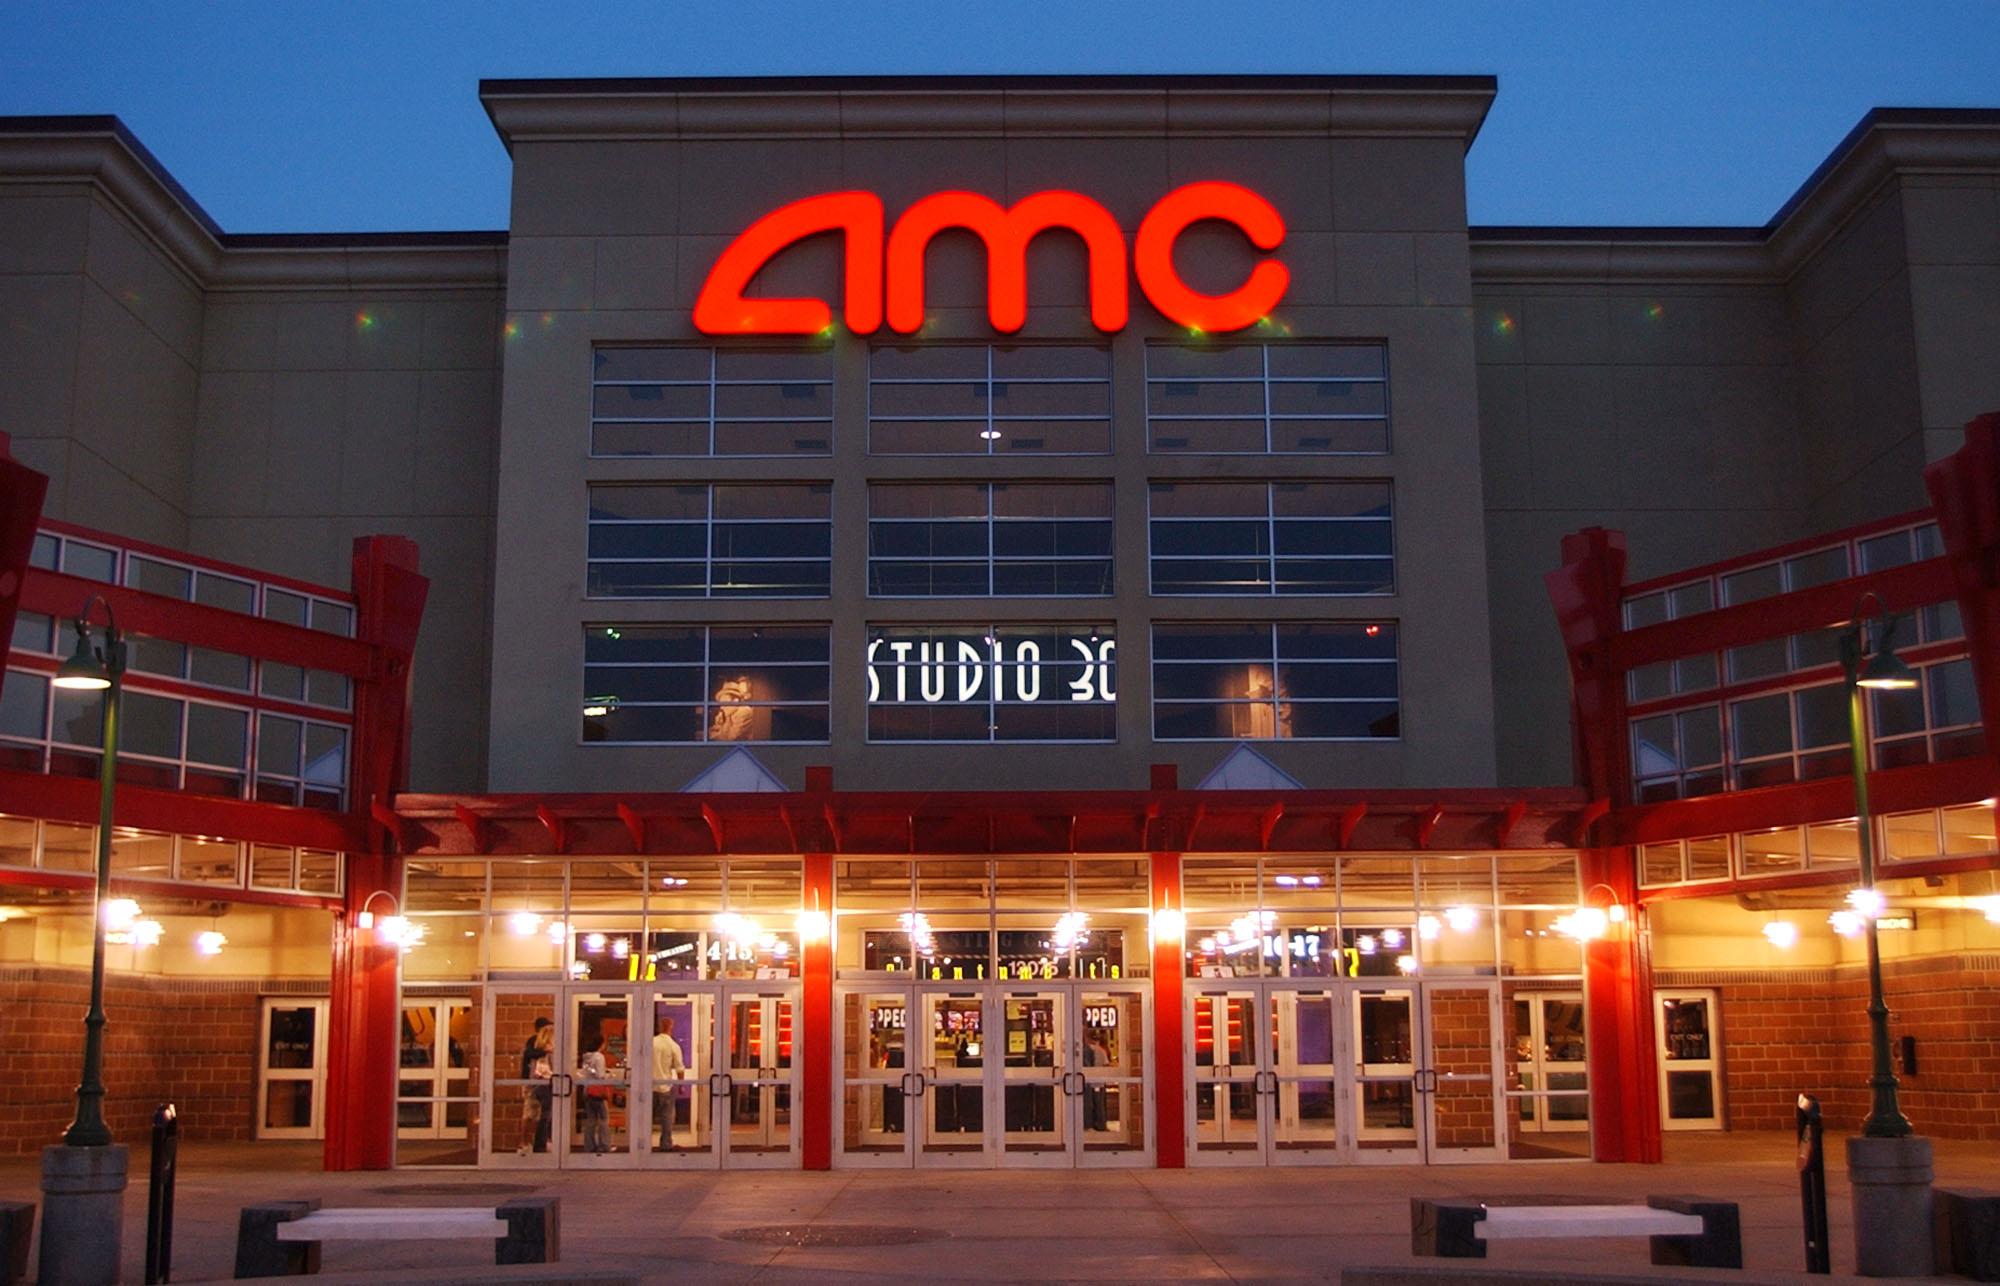 TellAMC Theatres Survey At www.Tellamc.com - Win Gift Card